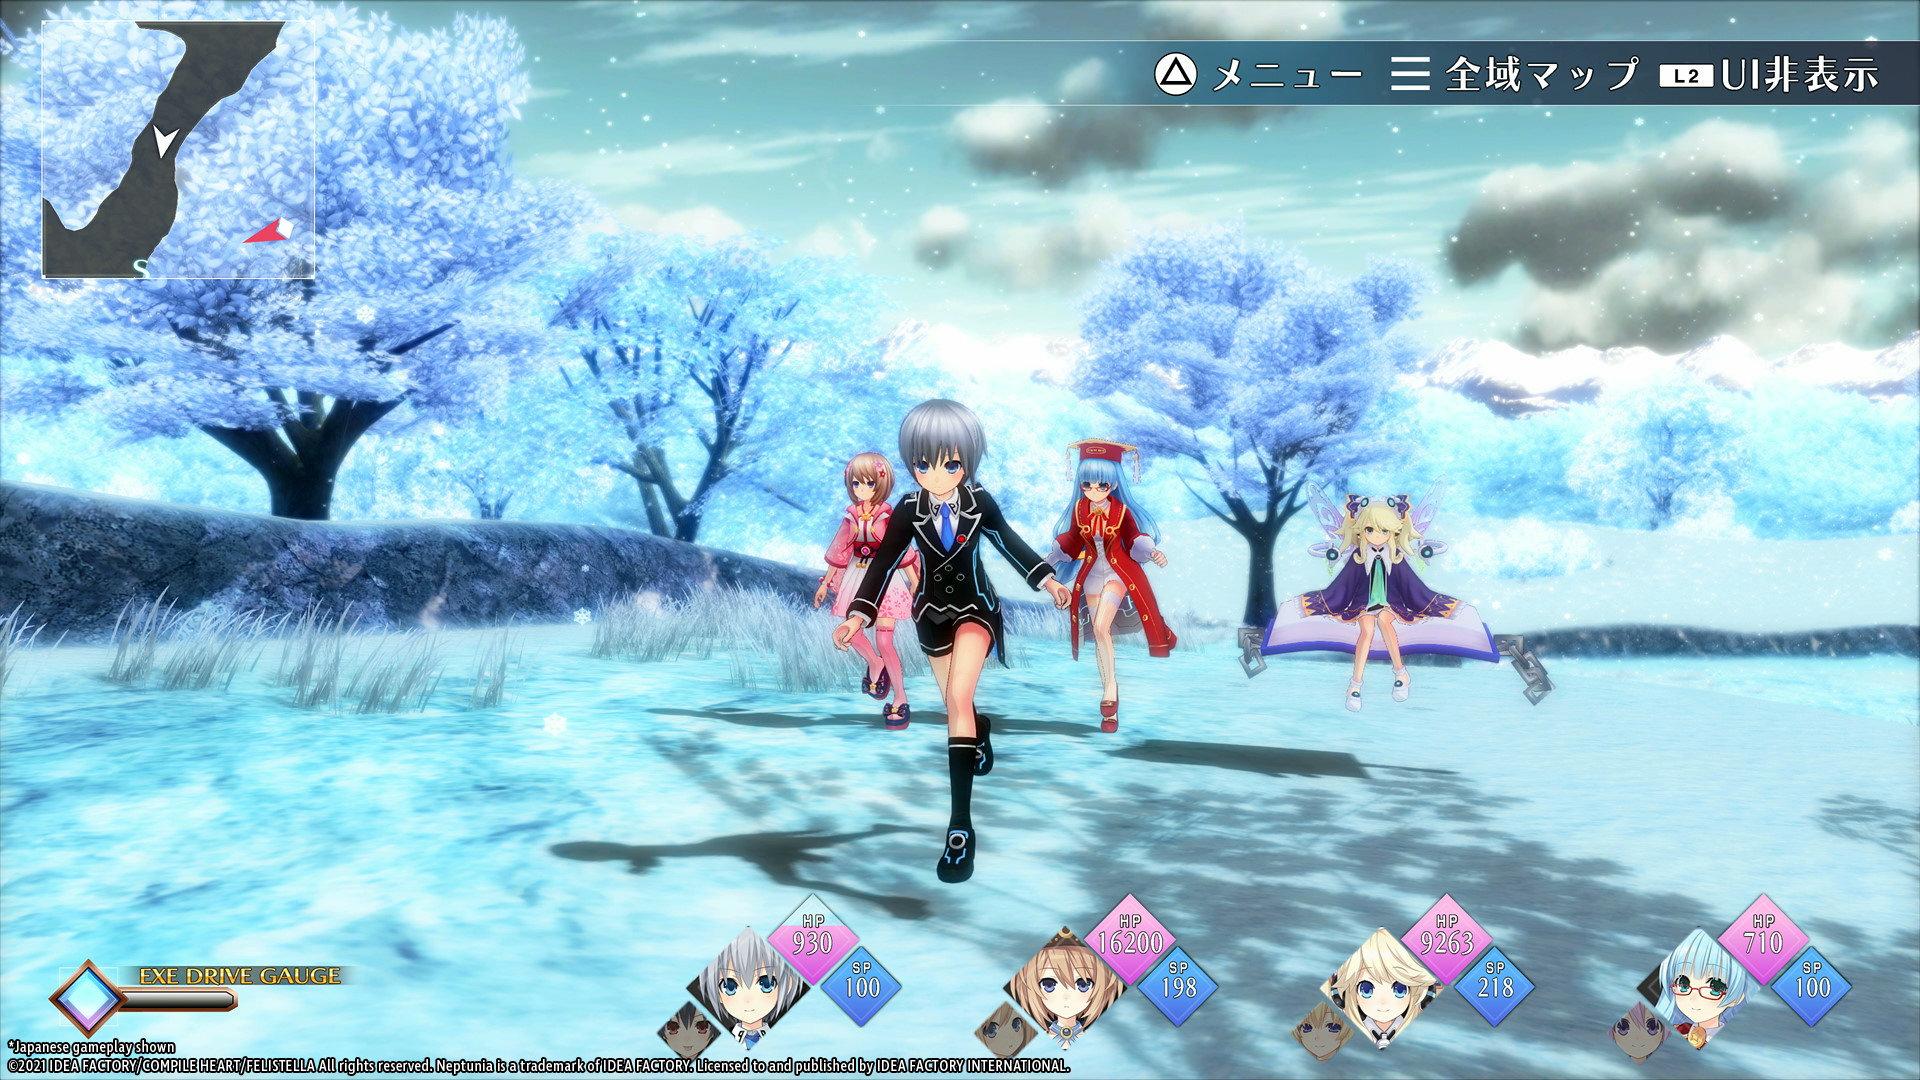 Neptunia Reverse characters running through a field